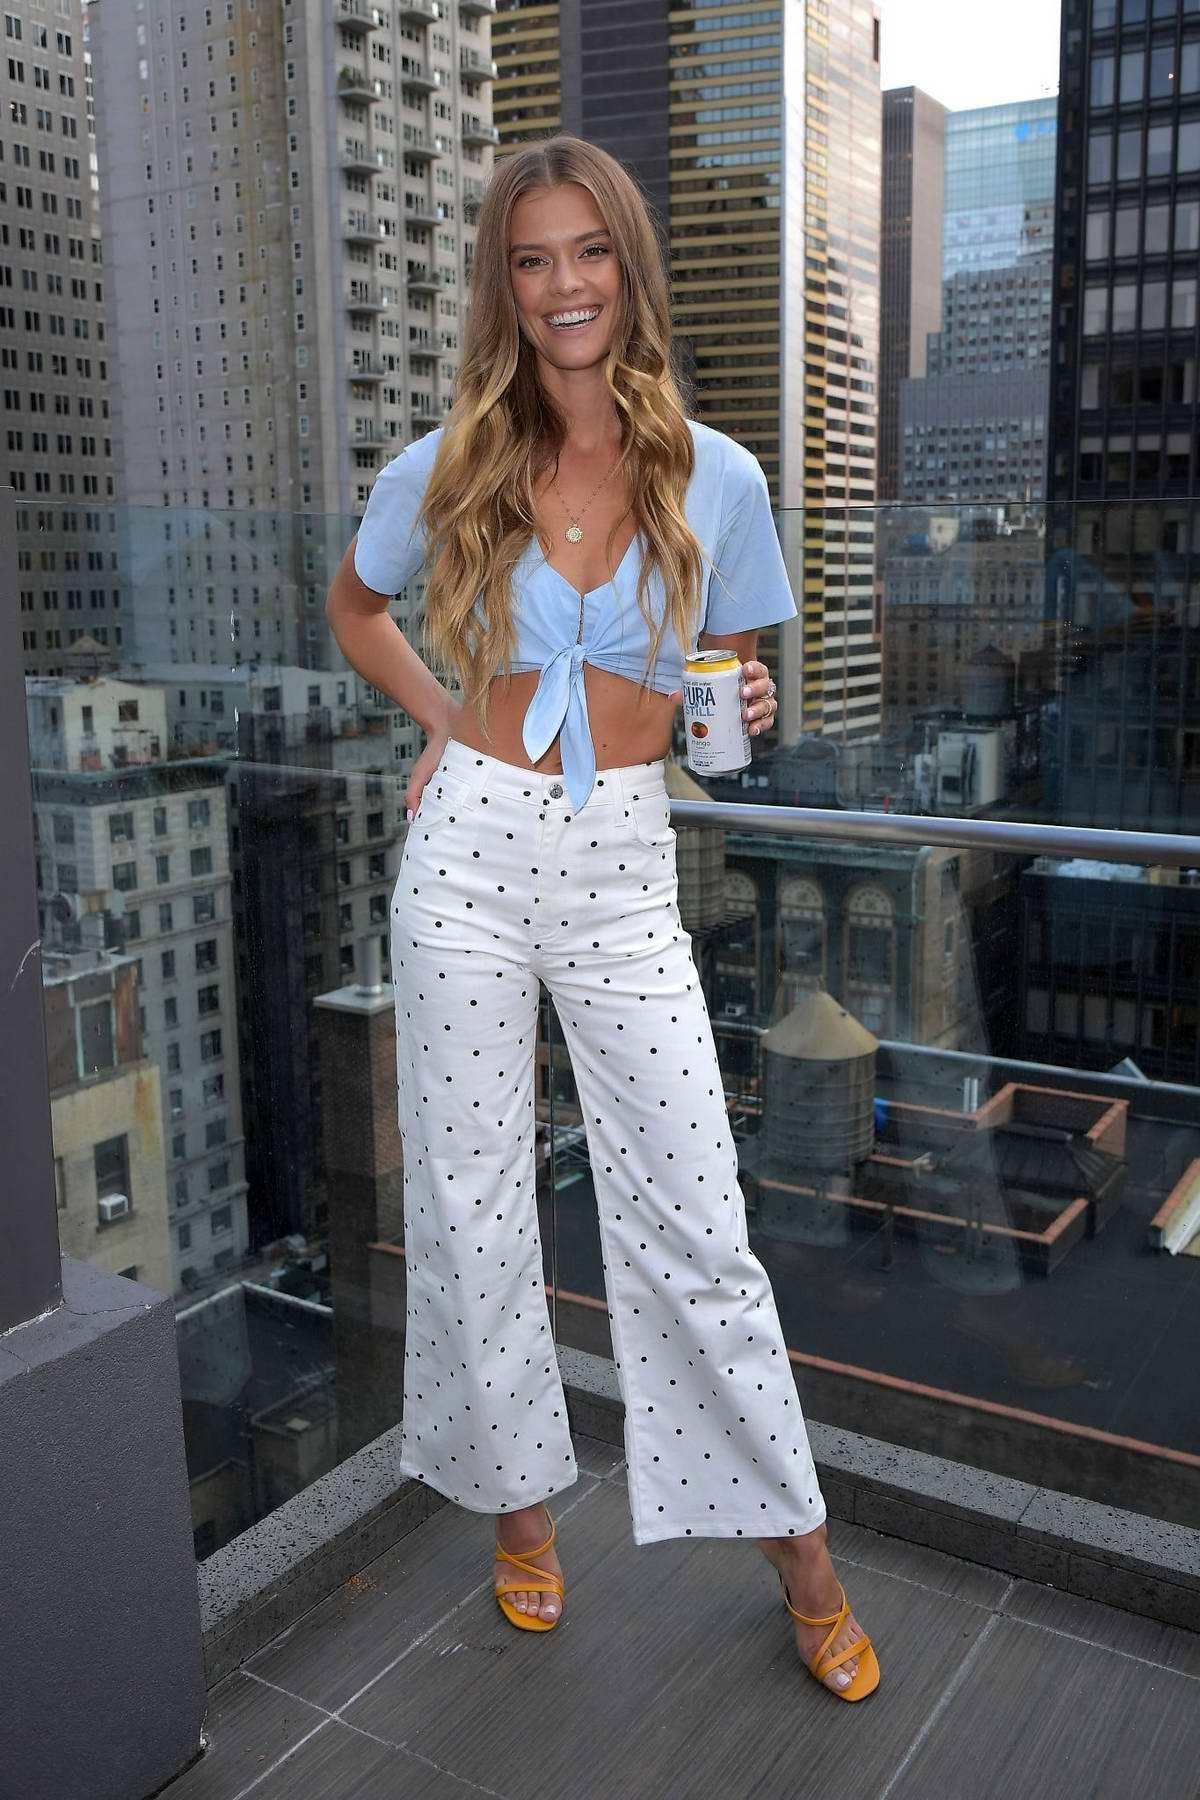 Nina Agdal celebrates at Pura Still spiked water bash in New York City